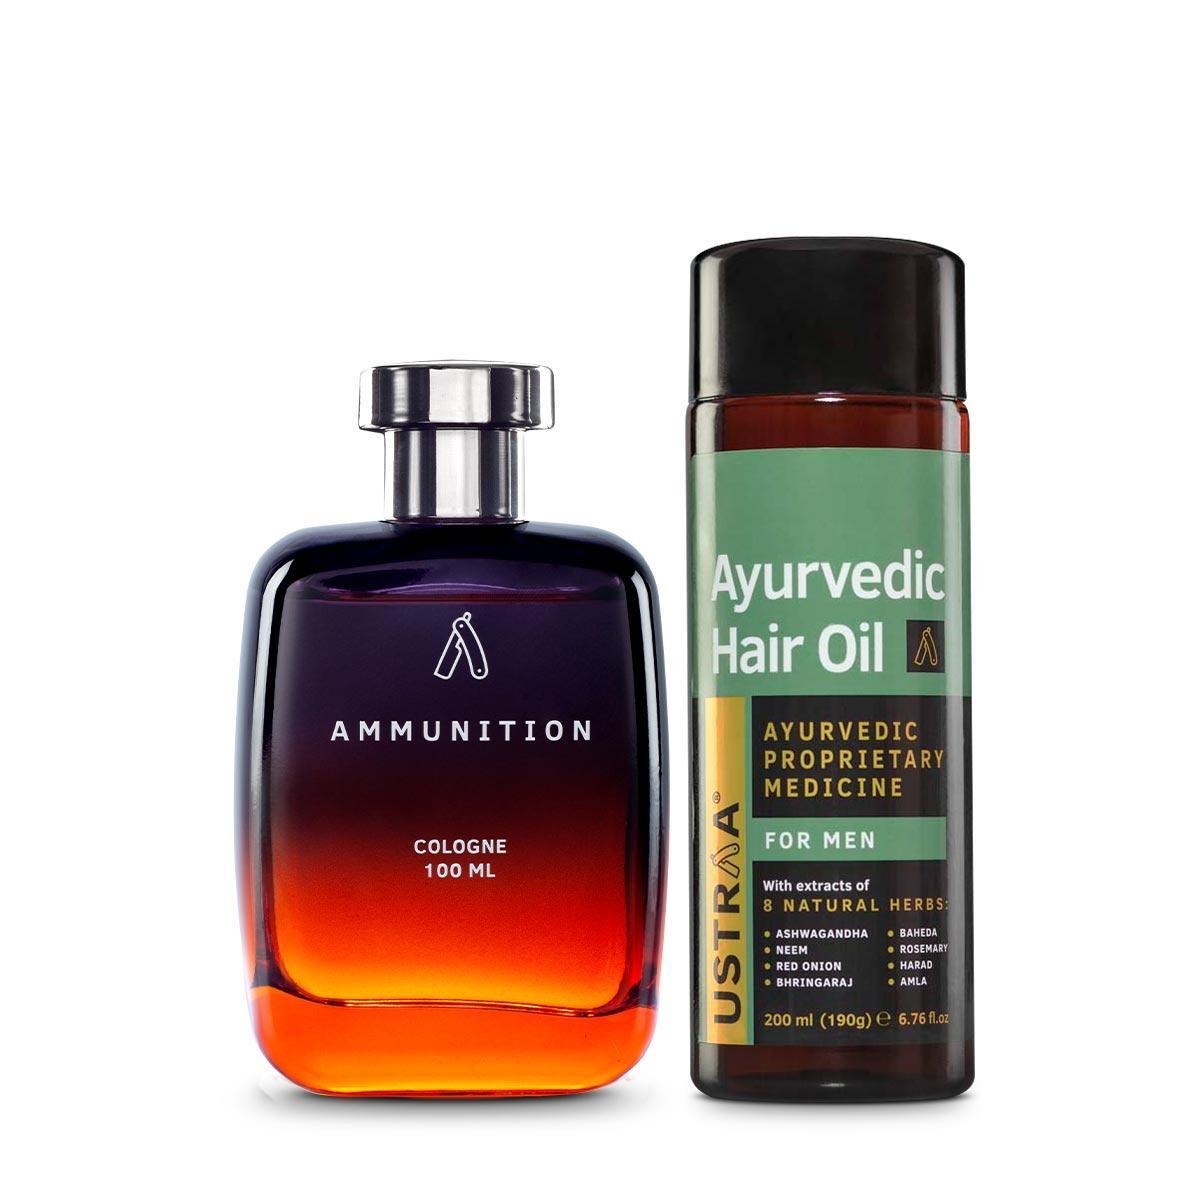 Ayurvedic Hair Oil & Cologne- Ammunition